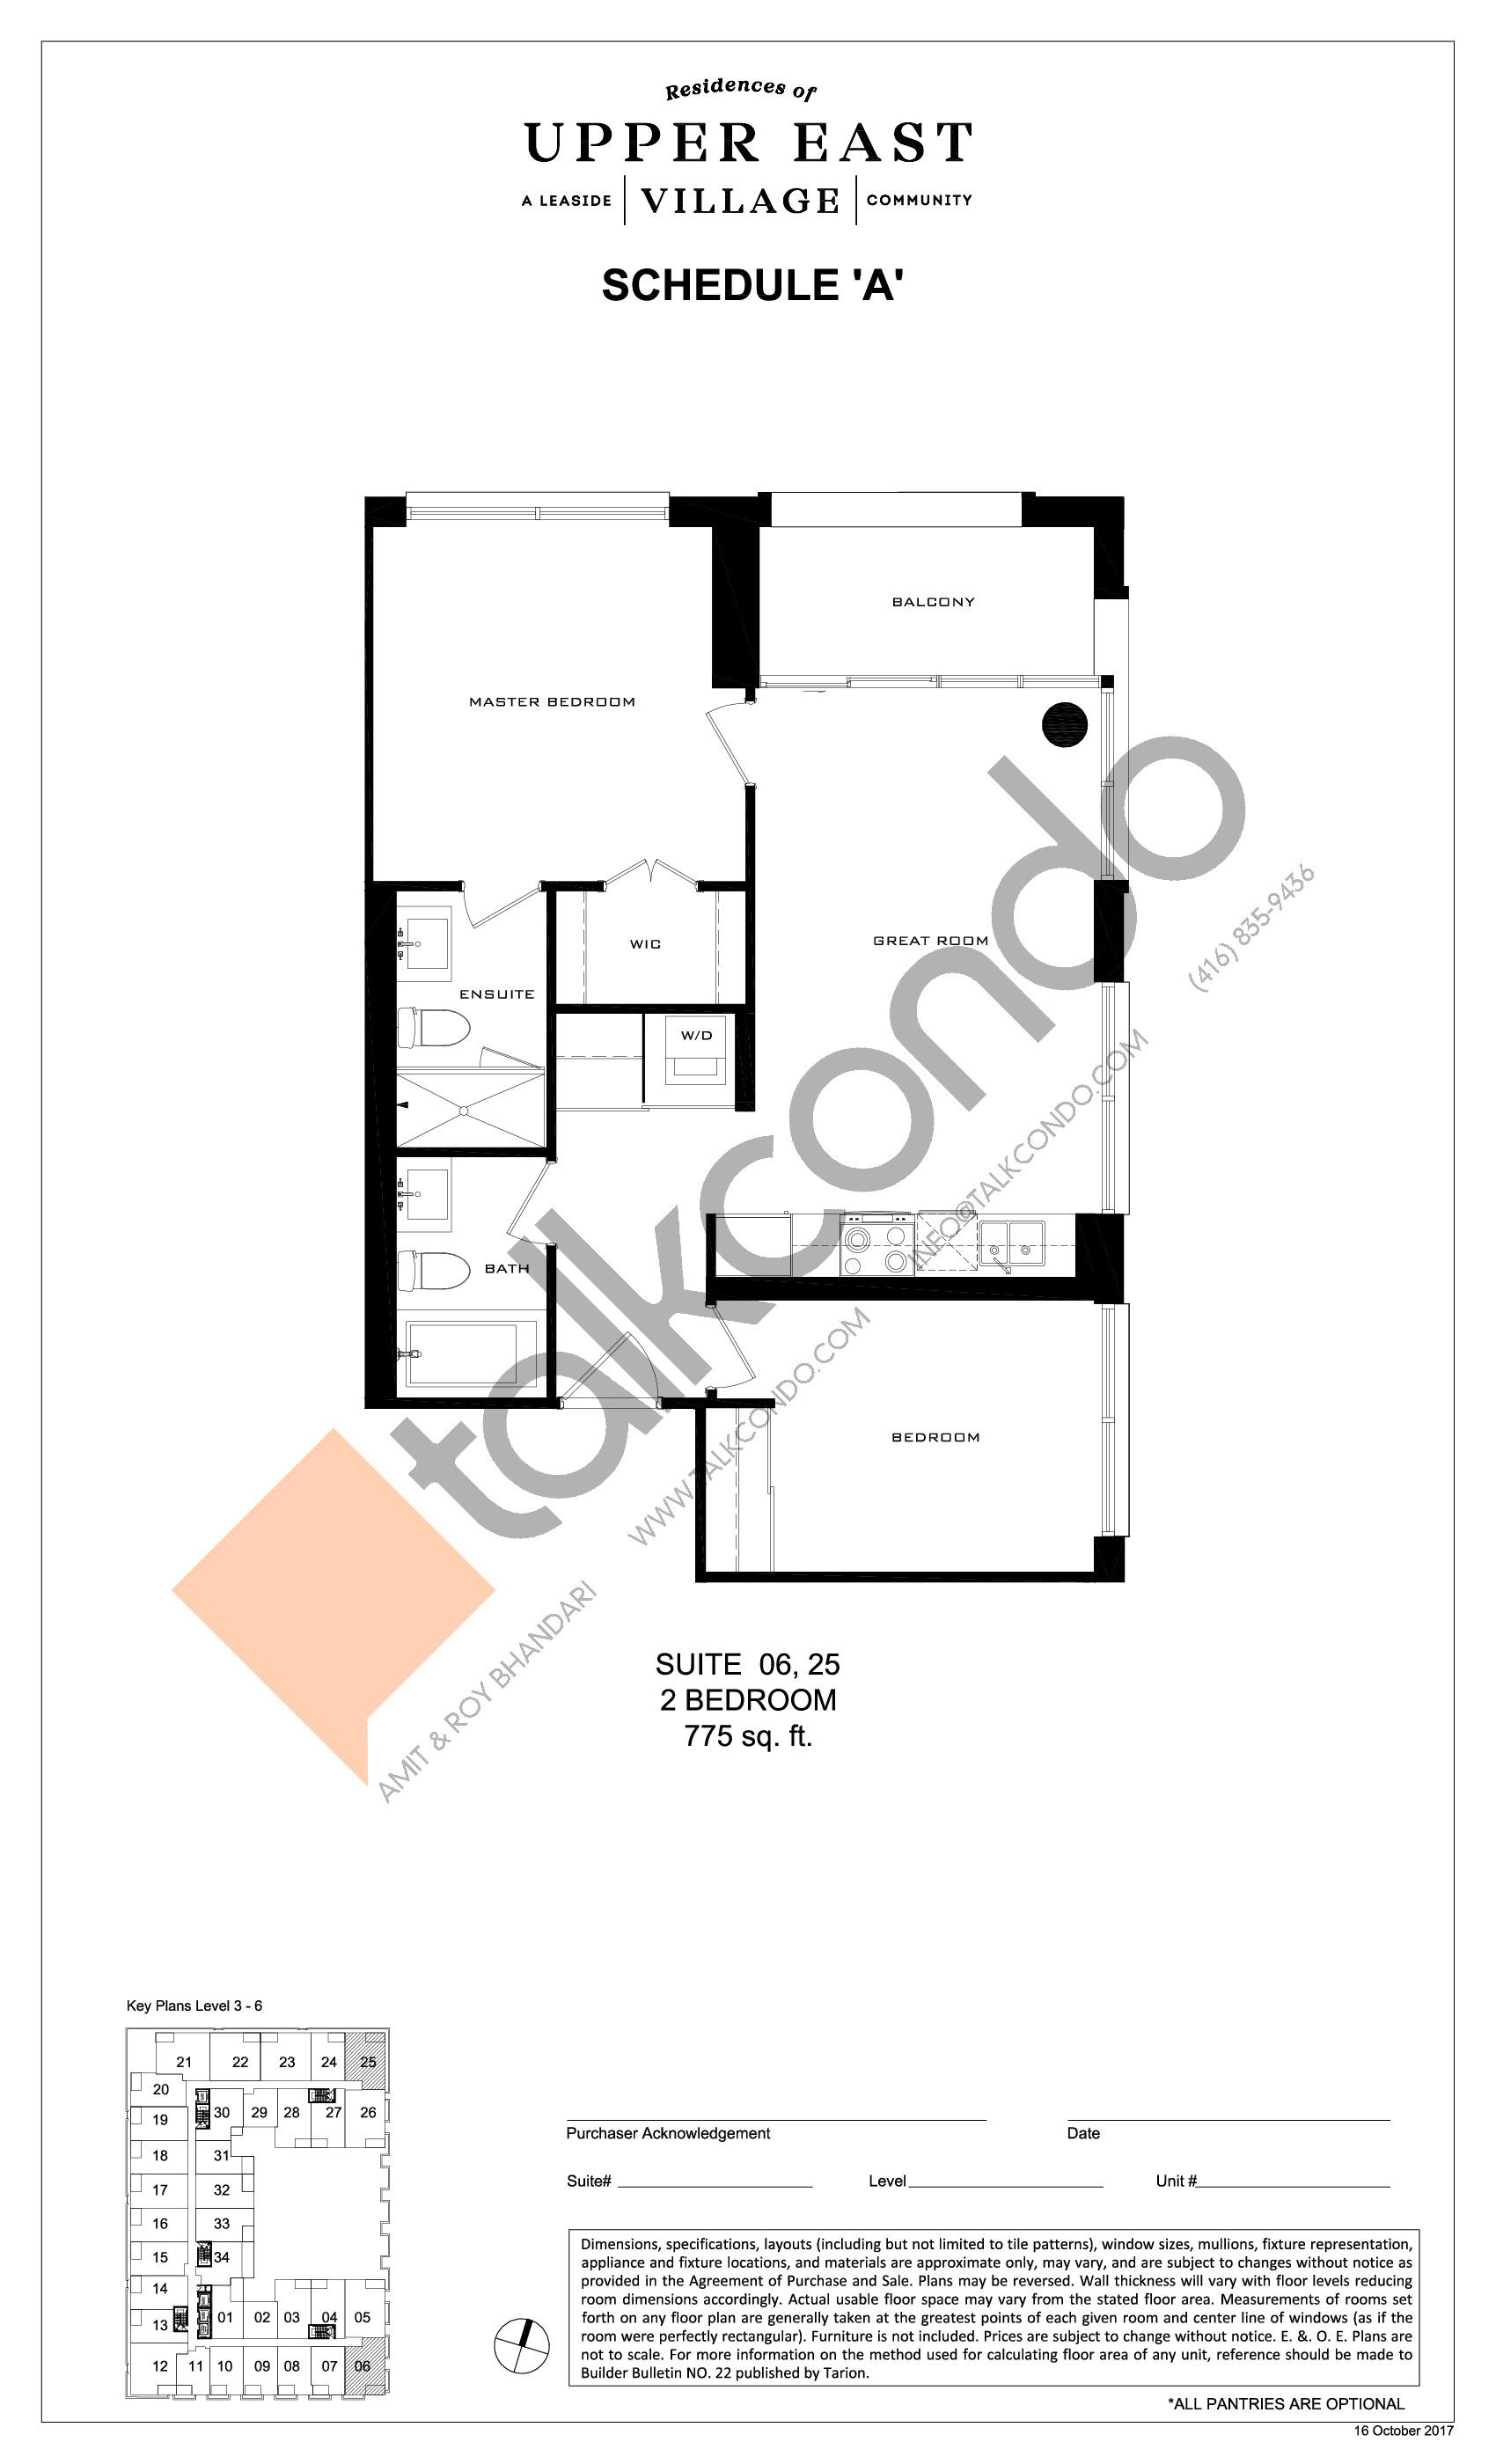 Suite 06, 25 Floor Plan at Upper East Village Condos - 775 sq.ft